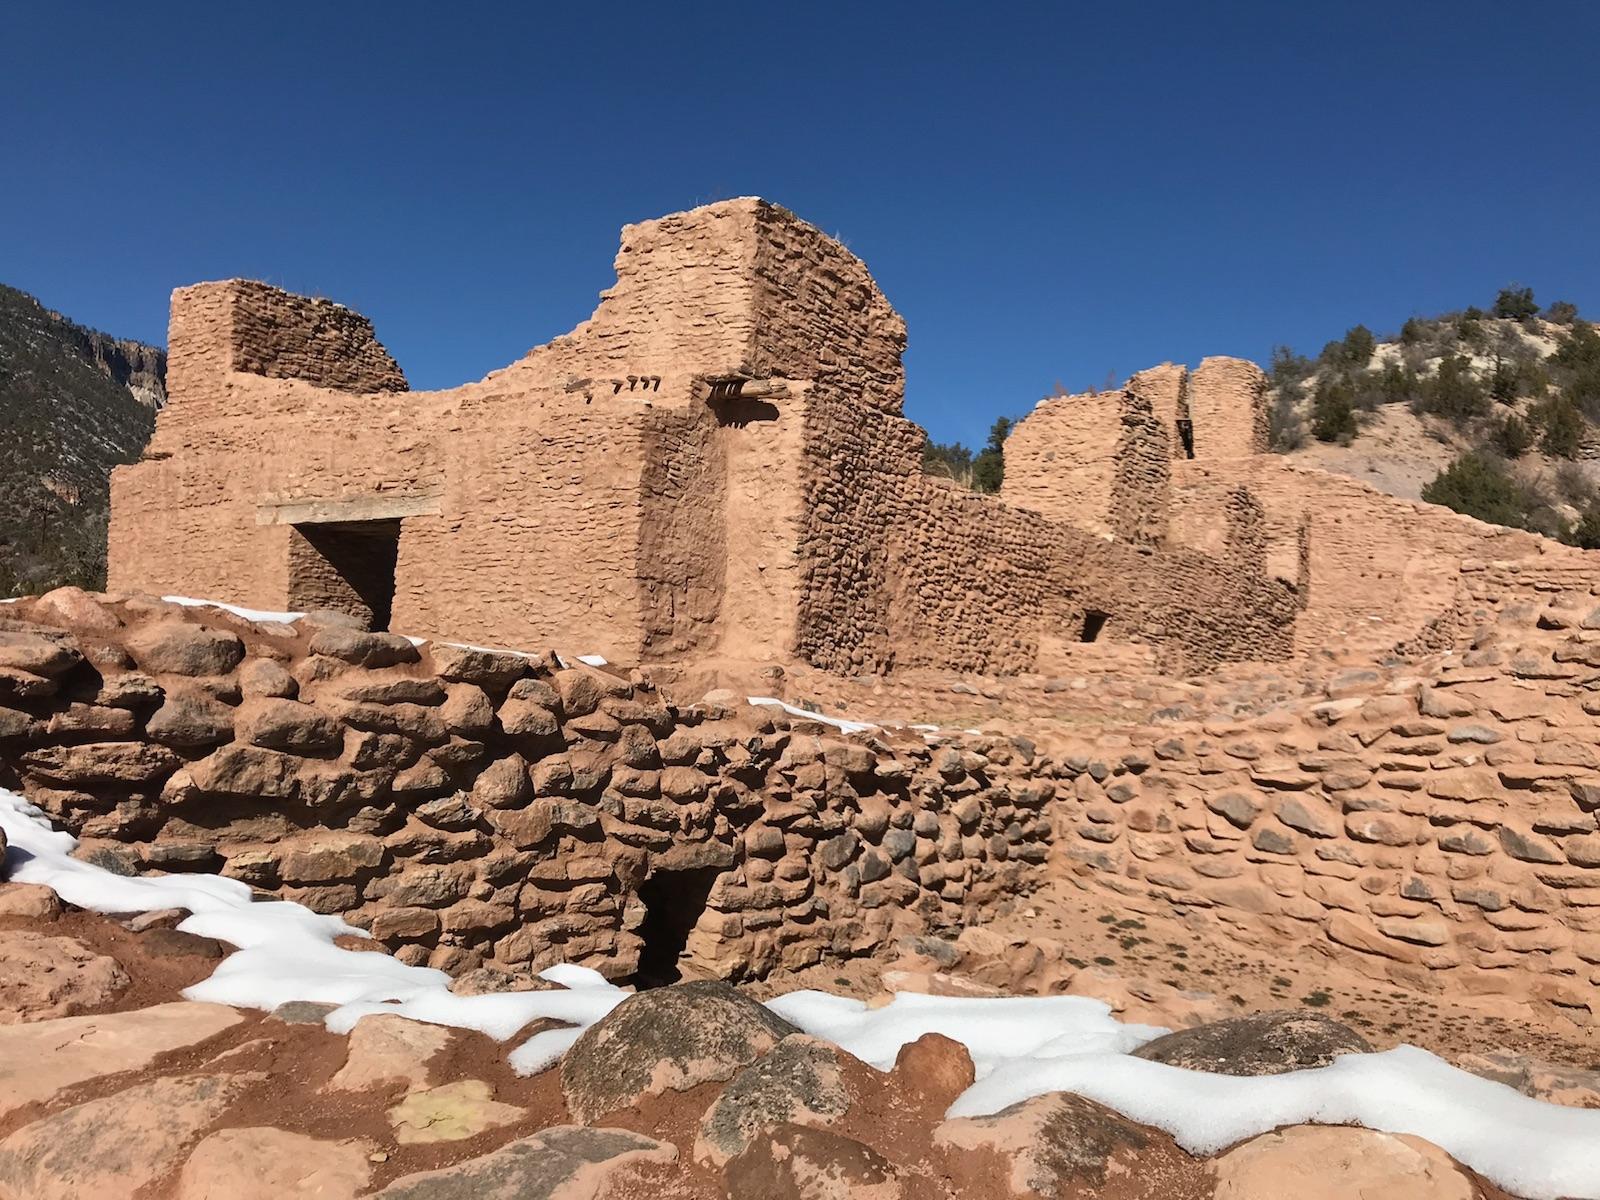 Ruins at Jemez Historic Site // Photo by Kerry M. Halasz